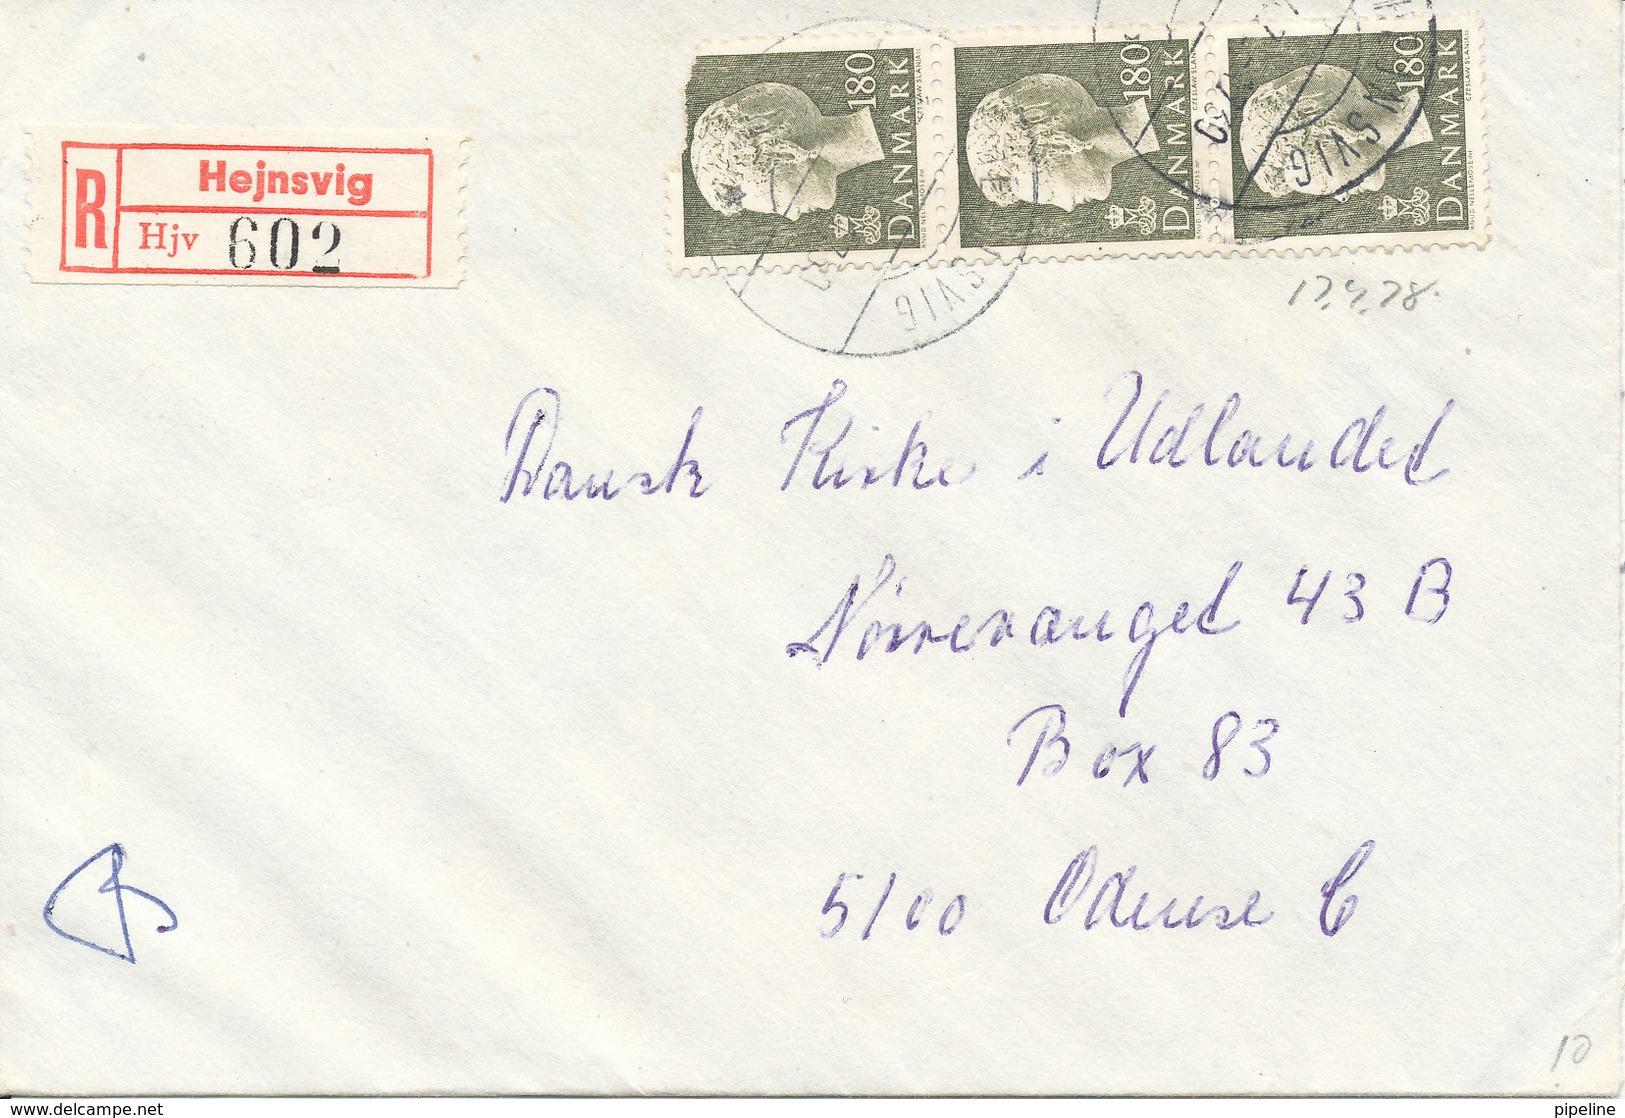 Denmark Registered Cover Hejnsvig 1978 - Peru